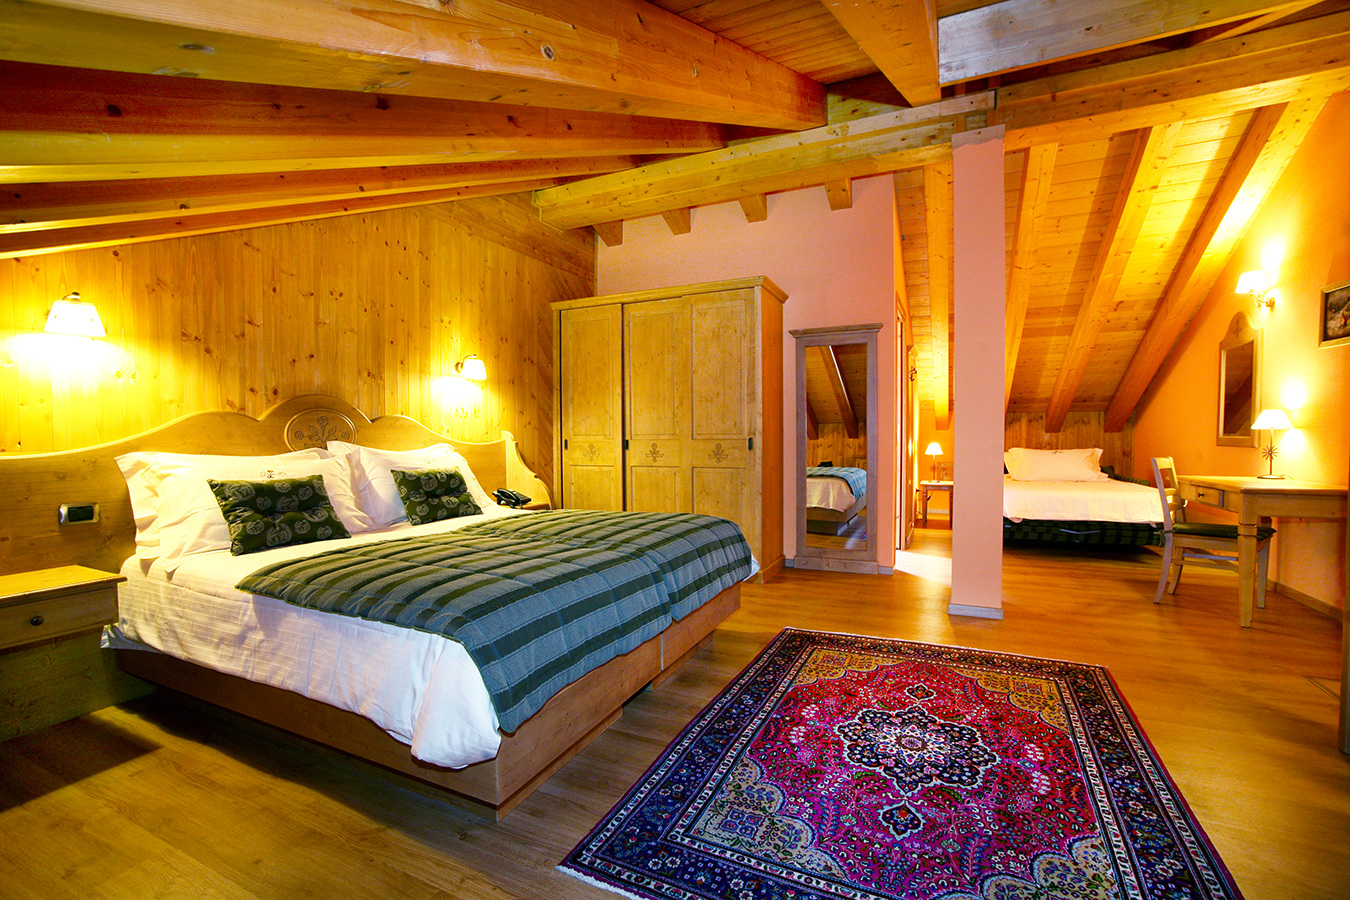 hotel boton d 39 or wellness la thuile aosta italy eat food. Black Bedroom Furniture Sets. Home Design Ideas